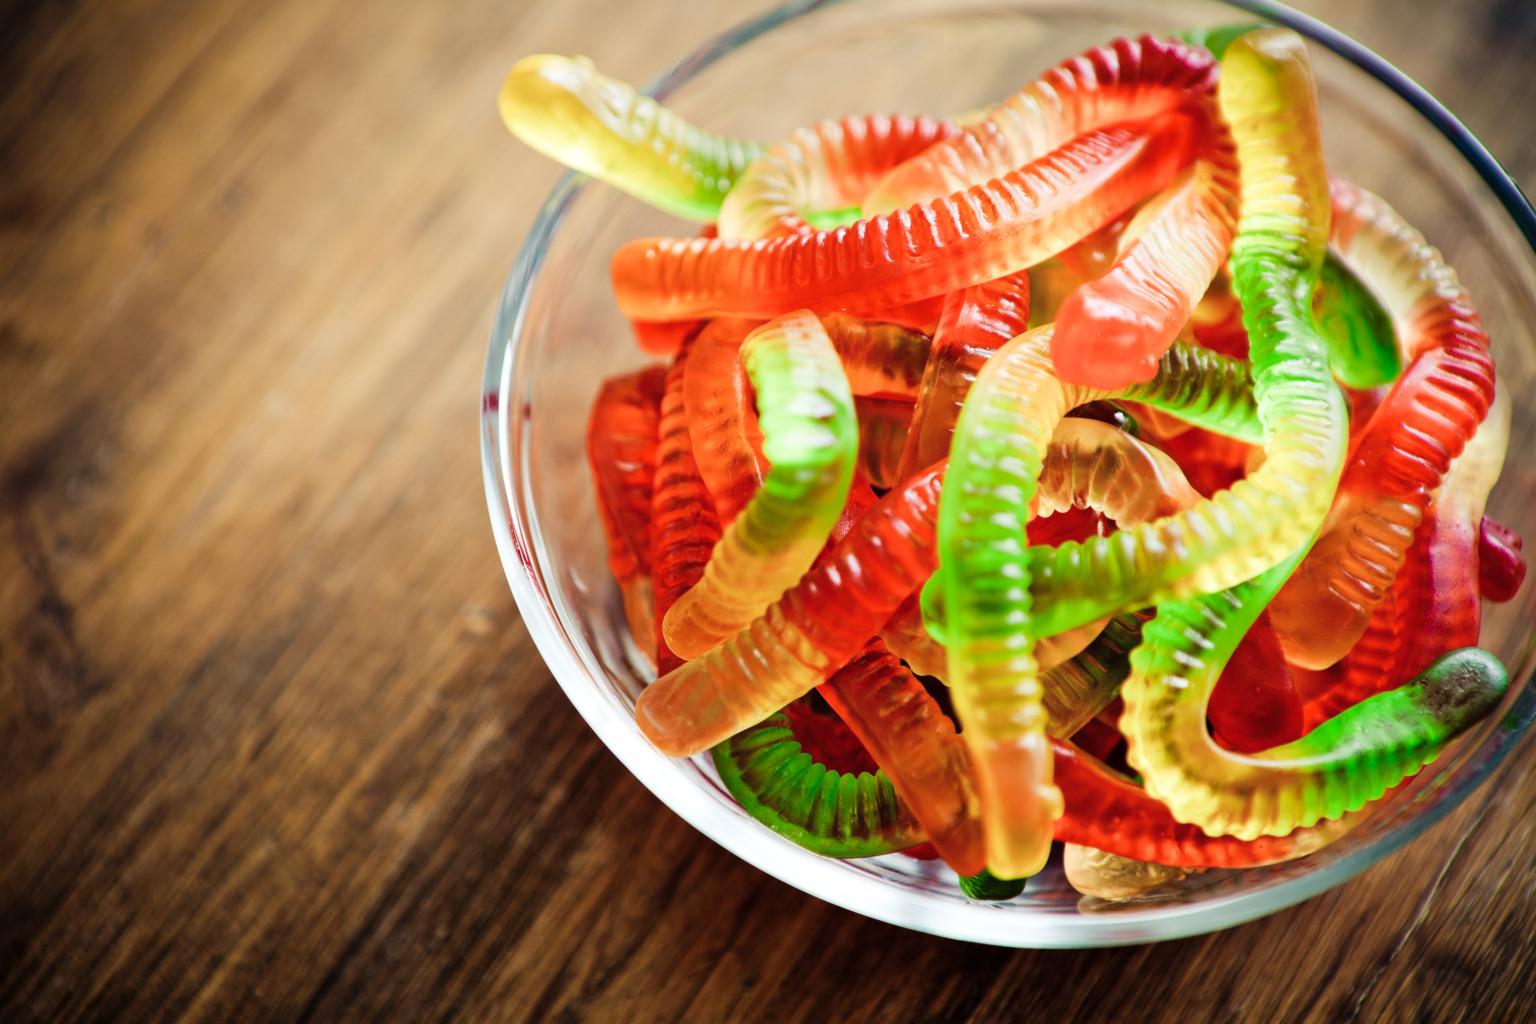 Gummy Worms And Life Wellpoliticallyspeaking